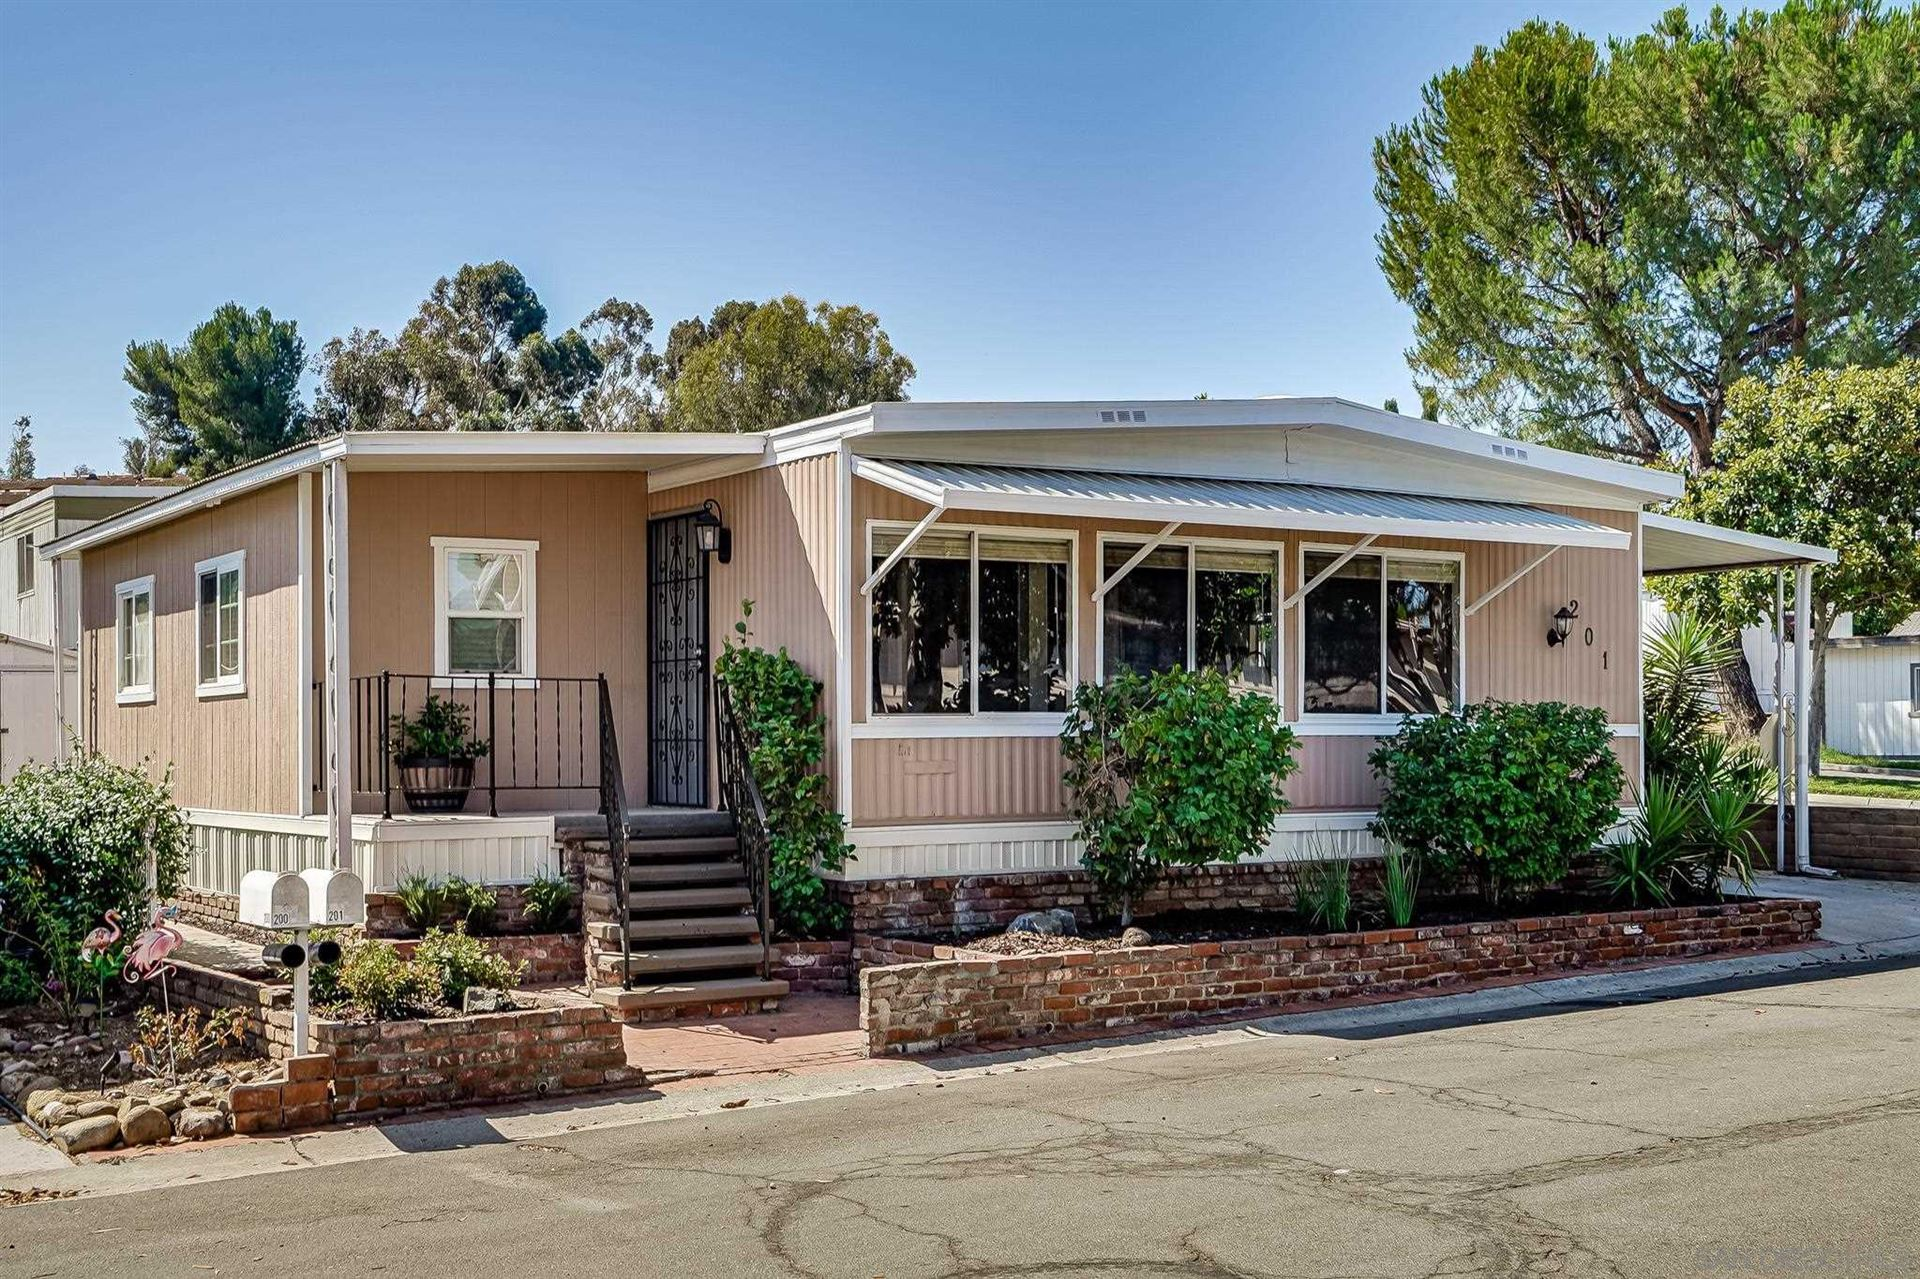 Photo of 10800 Woodside Ave SPC 201, Santee, CA 92071 (MLS # 210021521)